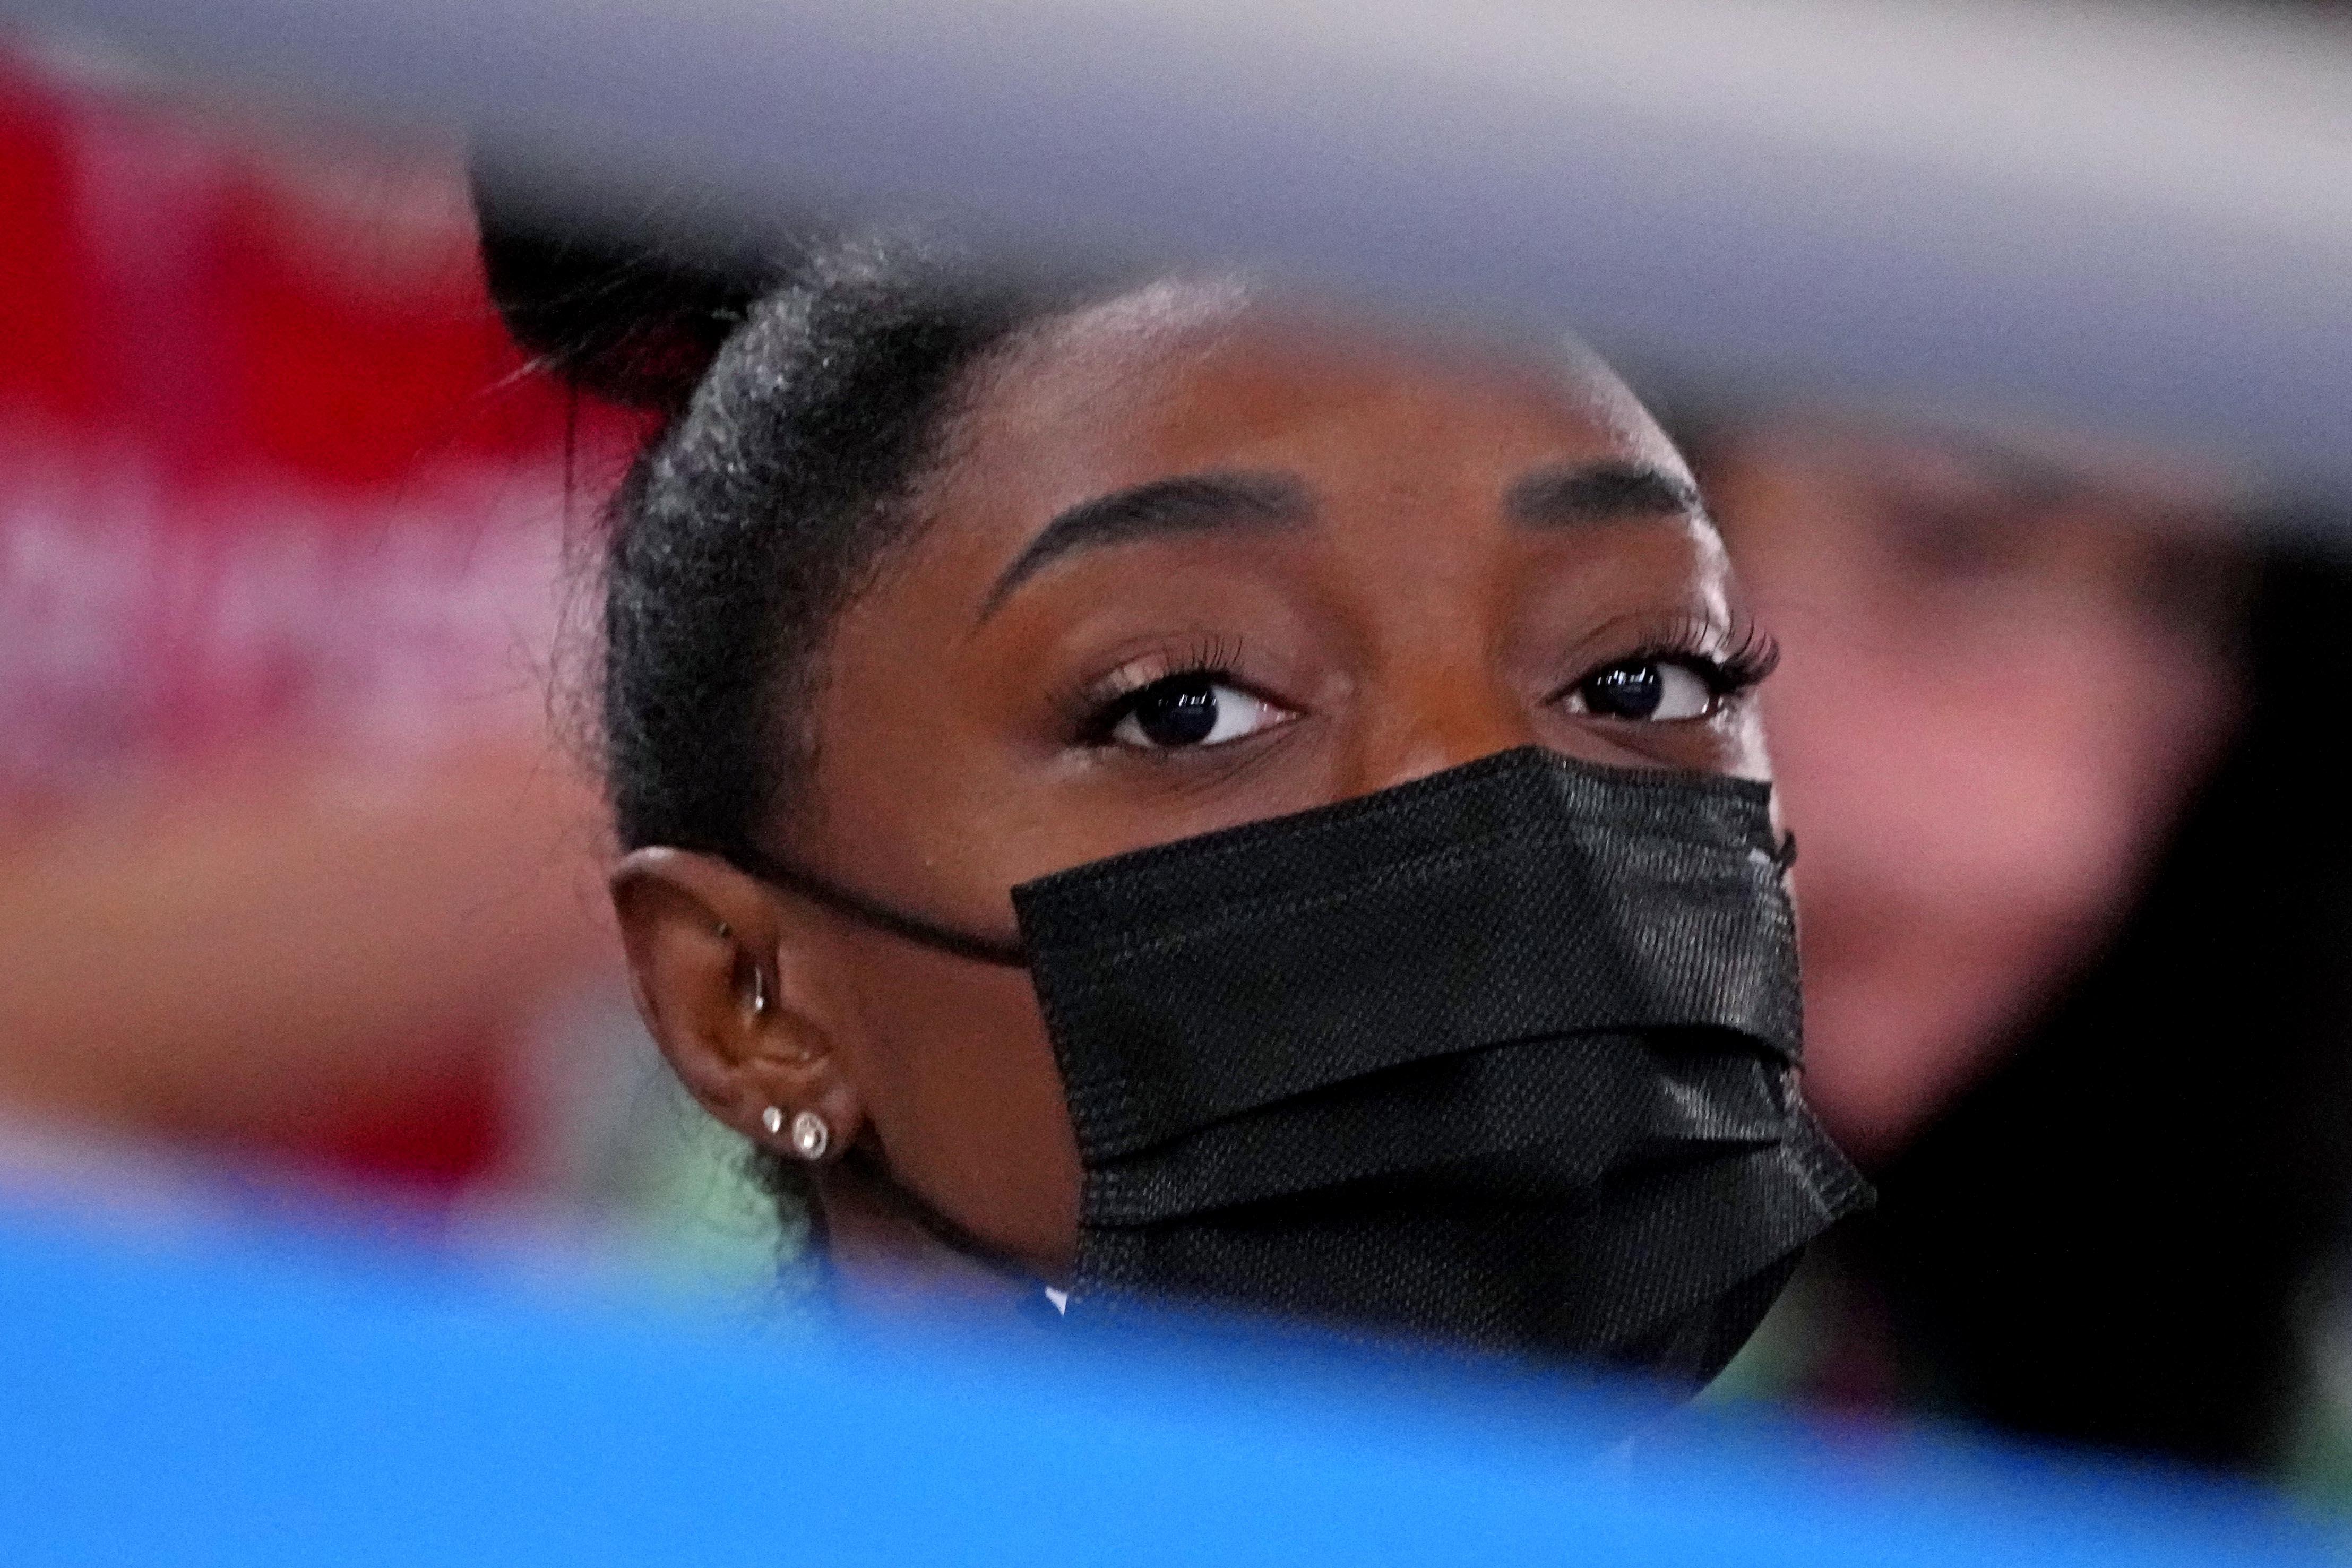 Jul 29, 2021; Tokyo, Japan; Simone Biles looks on in the women's gymnastics individual all-around final during the Tokyo 2020 Olympic Summer Games at Ariake Gymnastics Centre. Mandatory Credit: Robert Deutsch-USA TODAY Sports